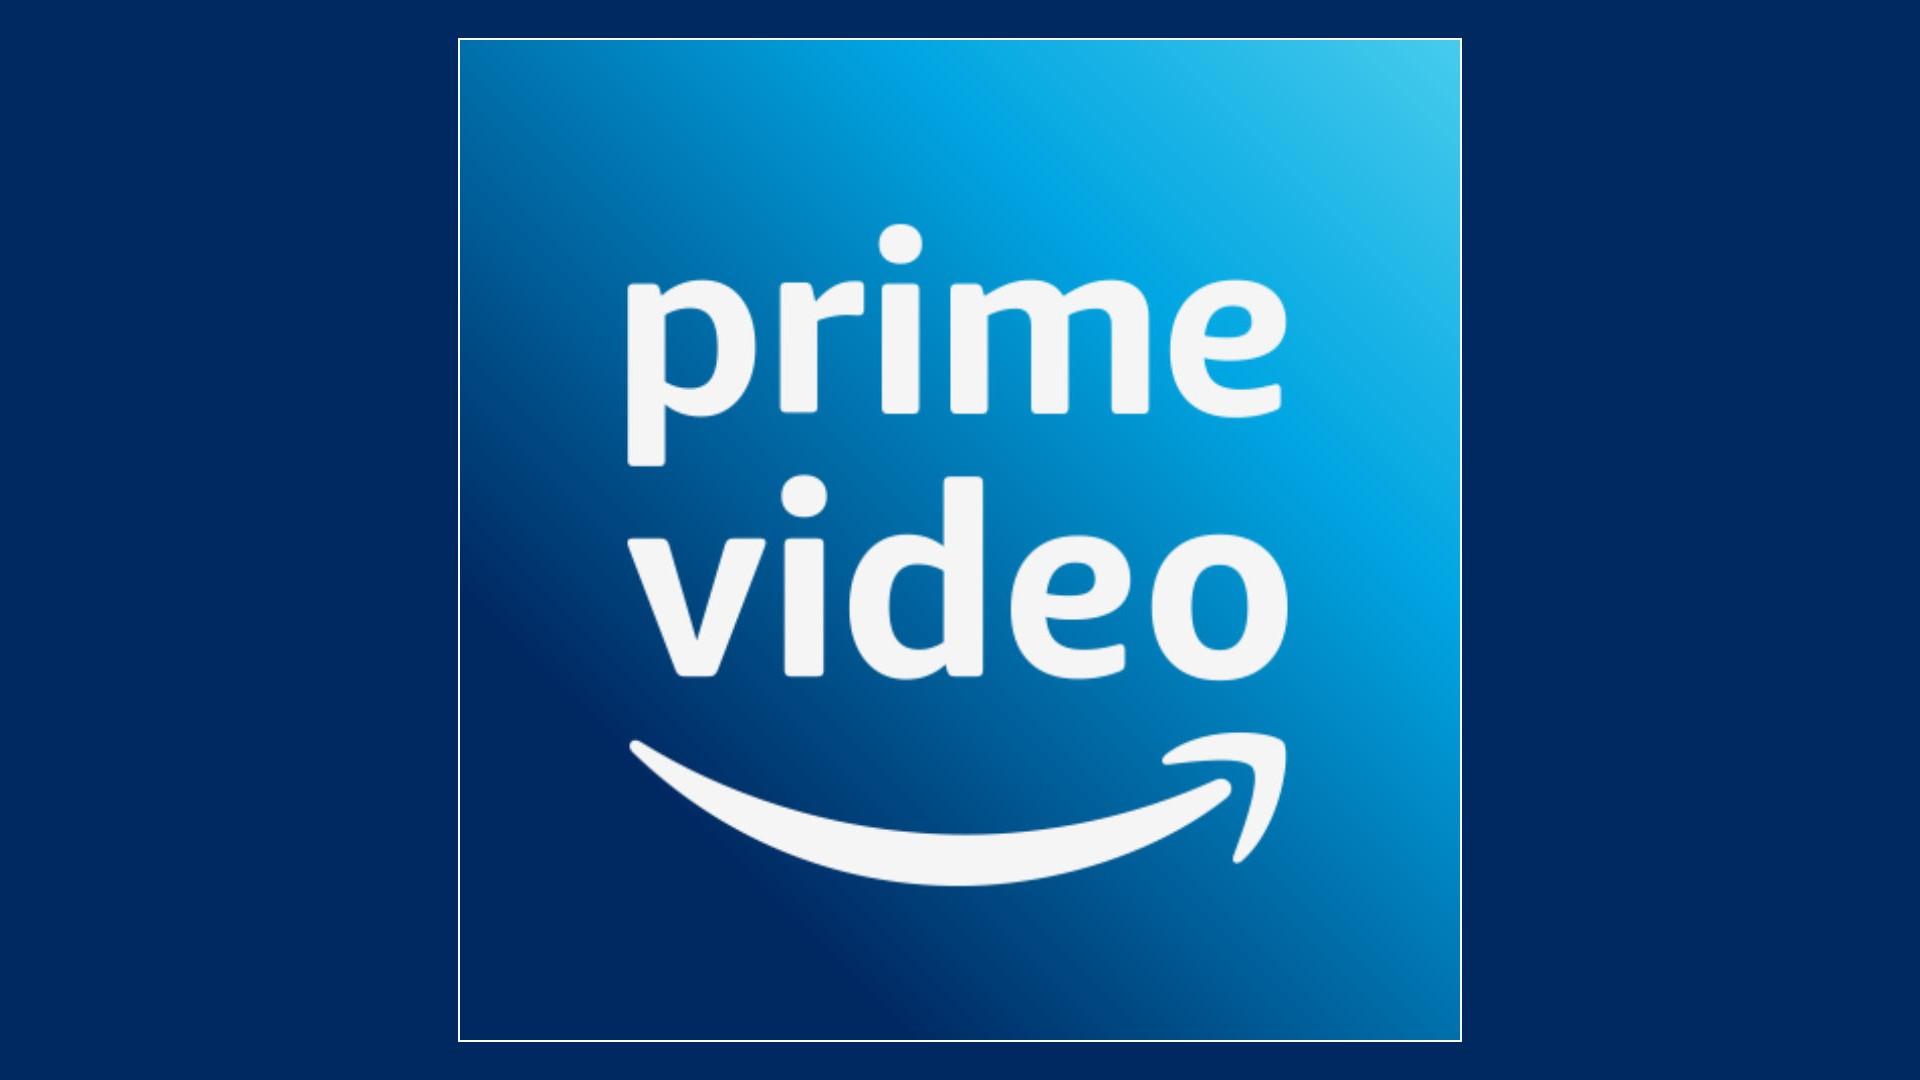 Amazon Prime Video (1) logo